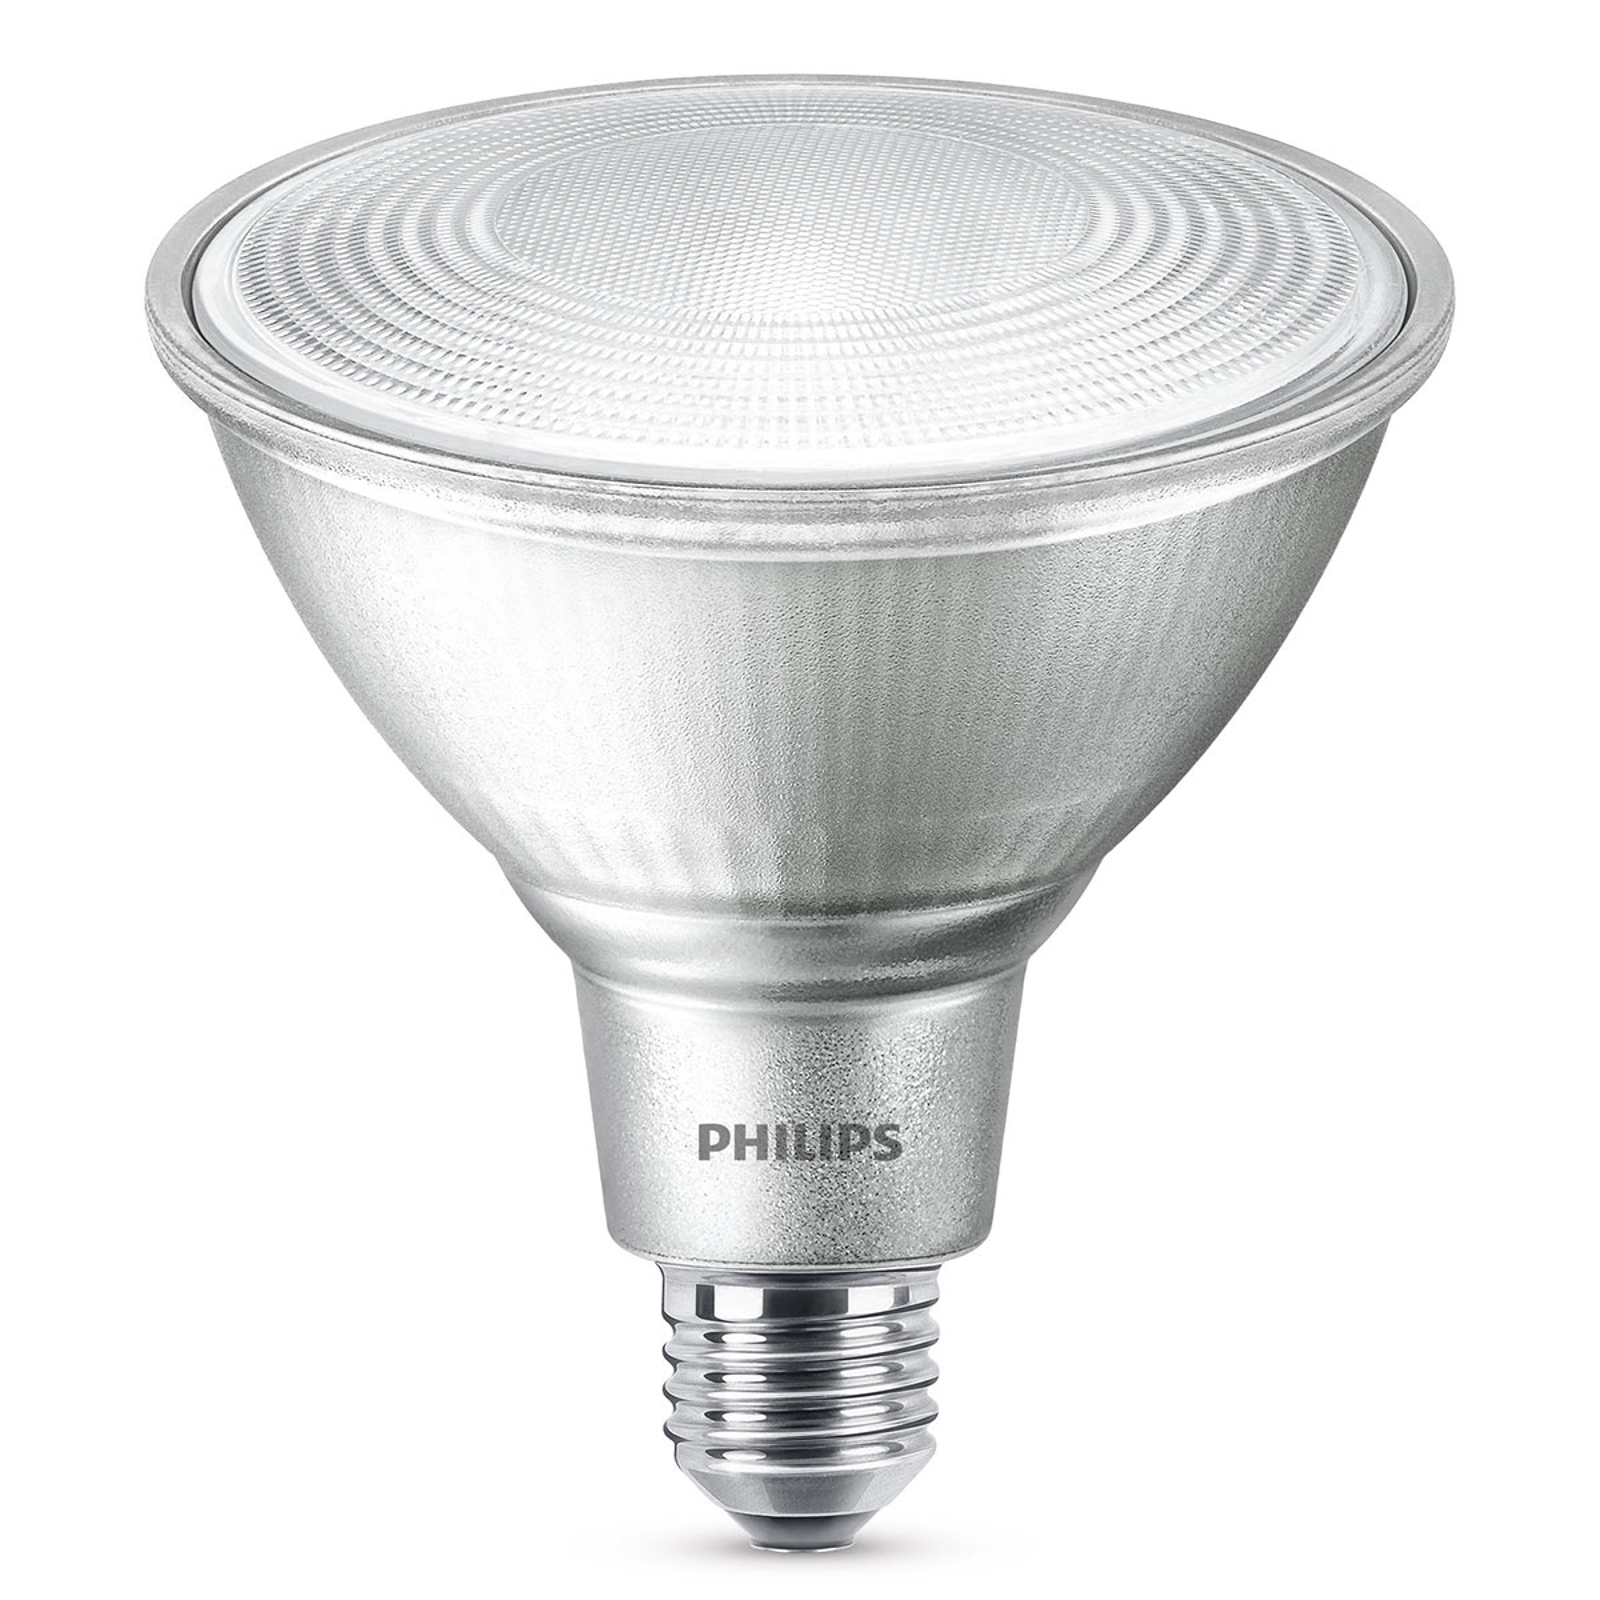 Philips LED-Reflektor E27 PAR38 13W 827 dimmbar